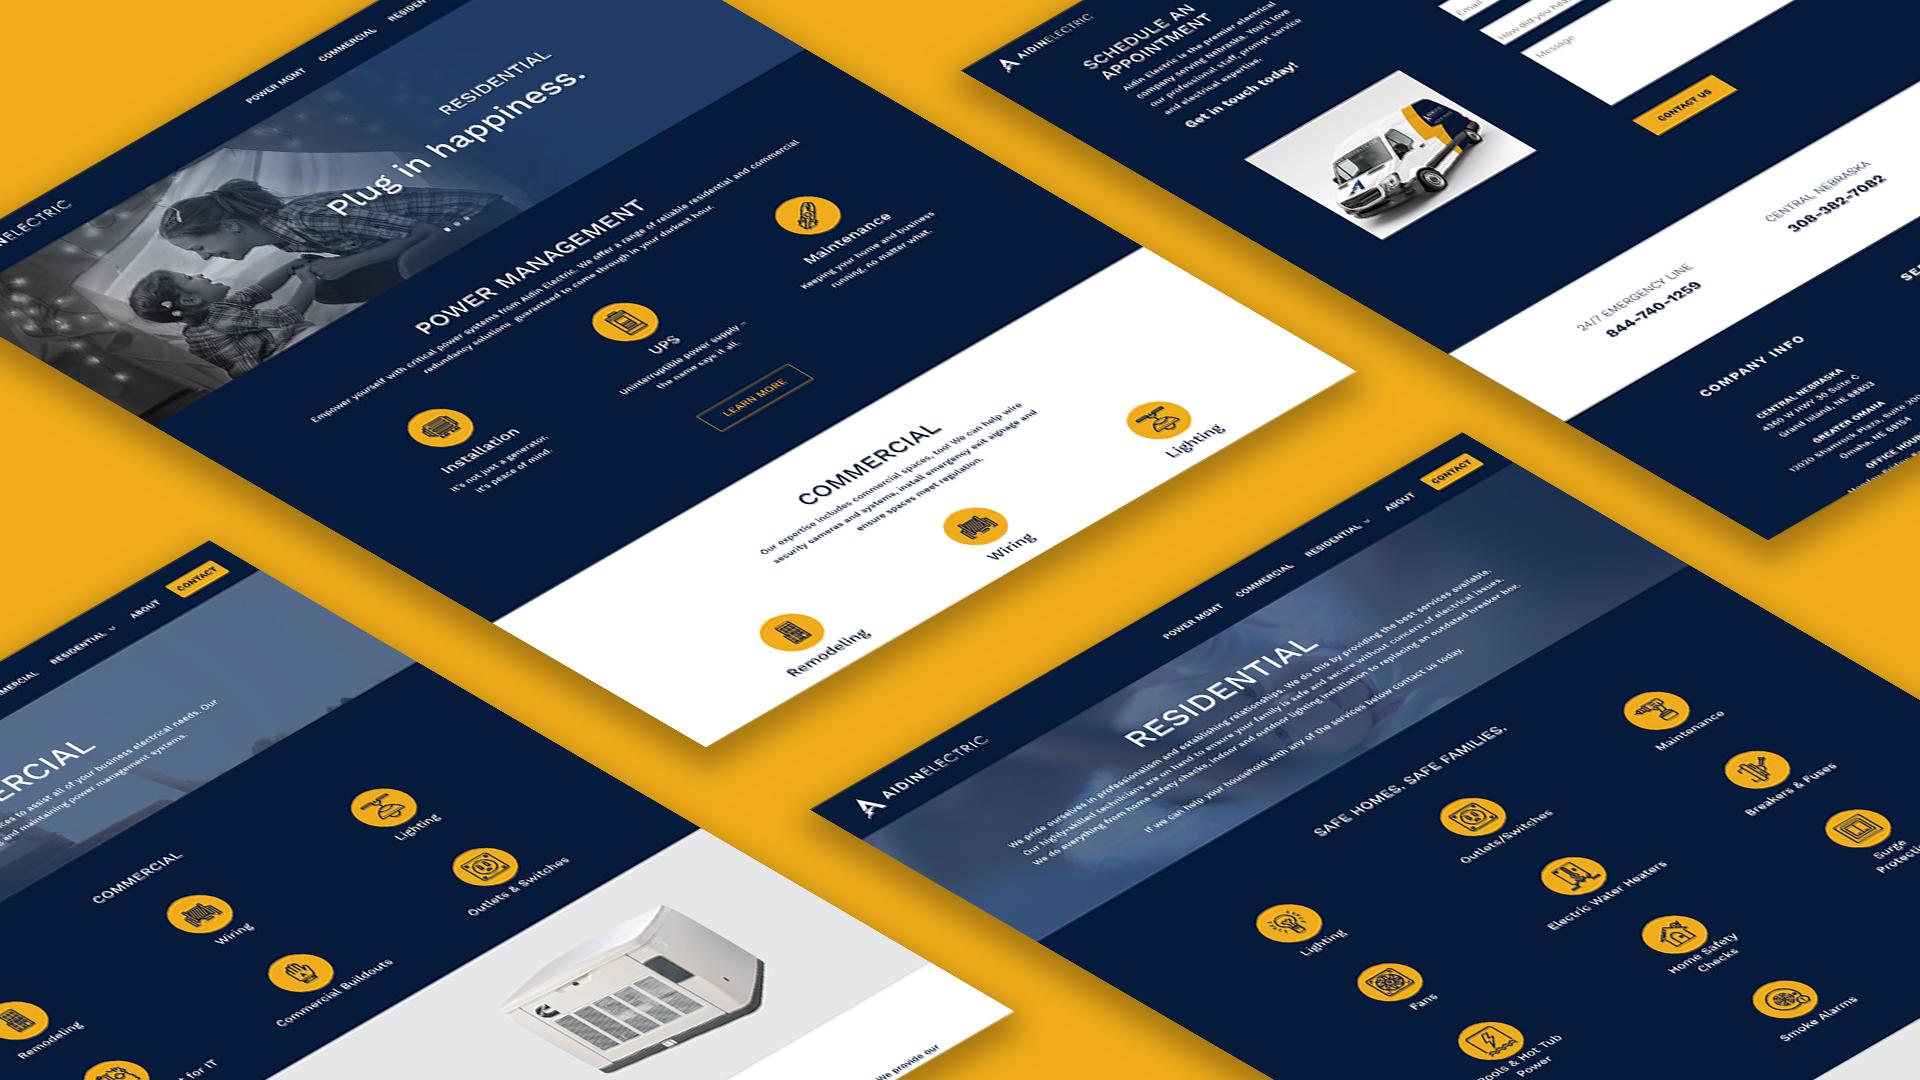 Aidin Electric ipad website display Agency 877